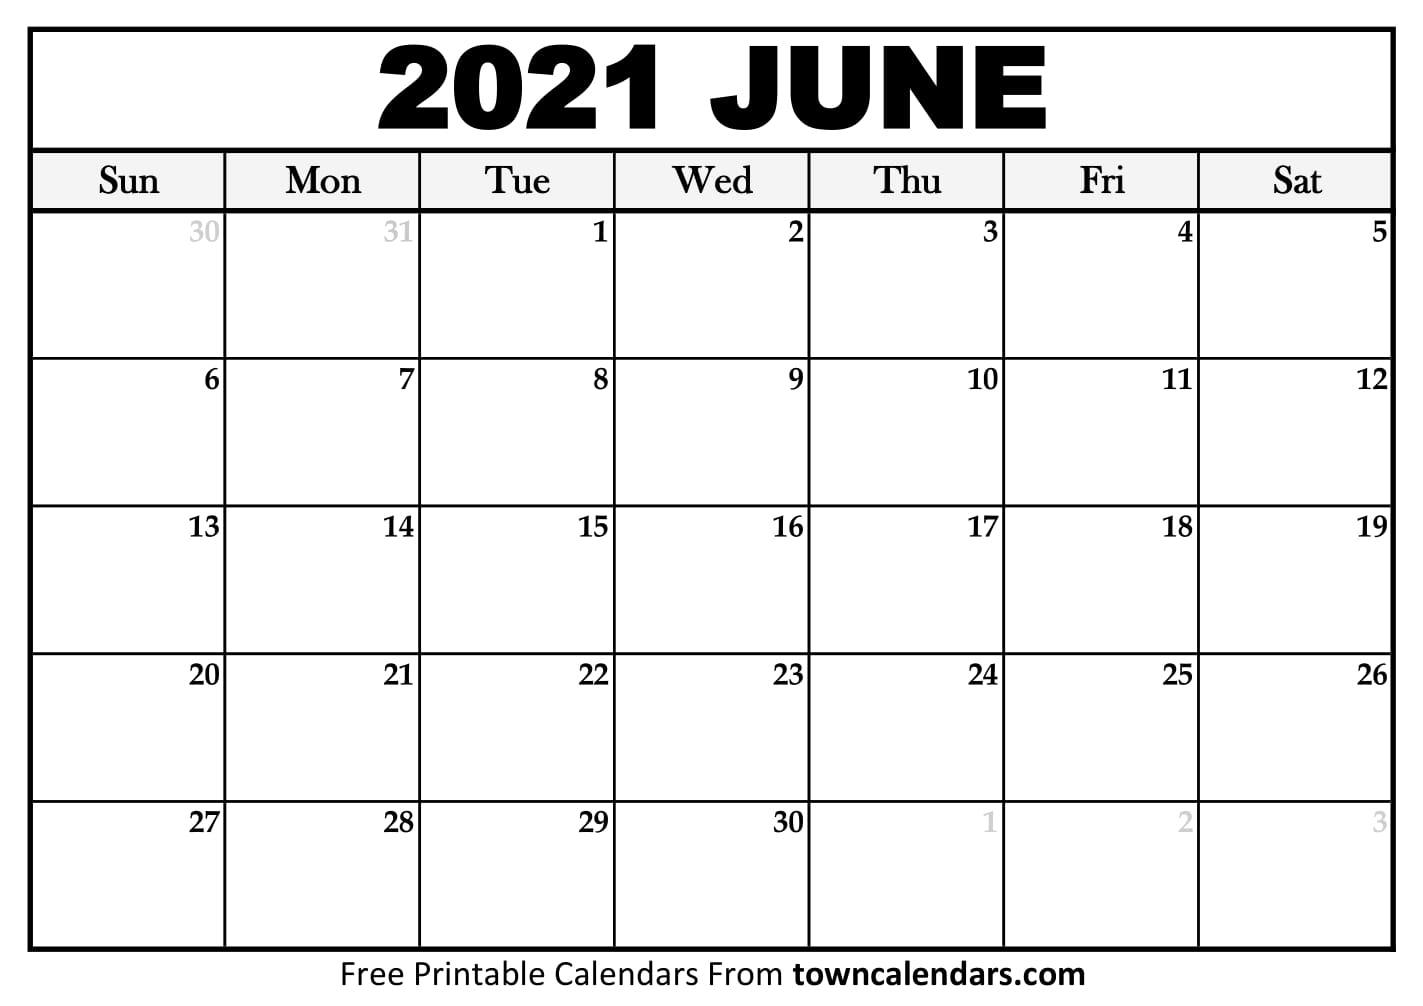 Catch Downloadable Calendar Print Out 2021